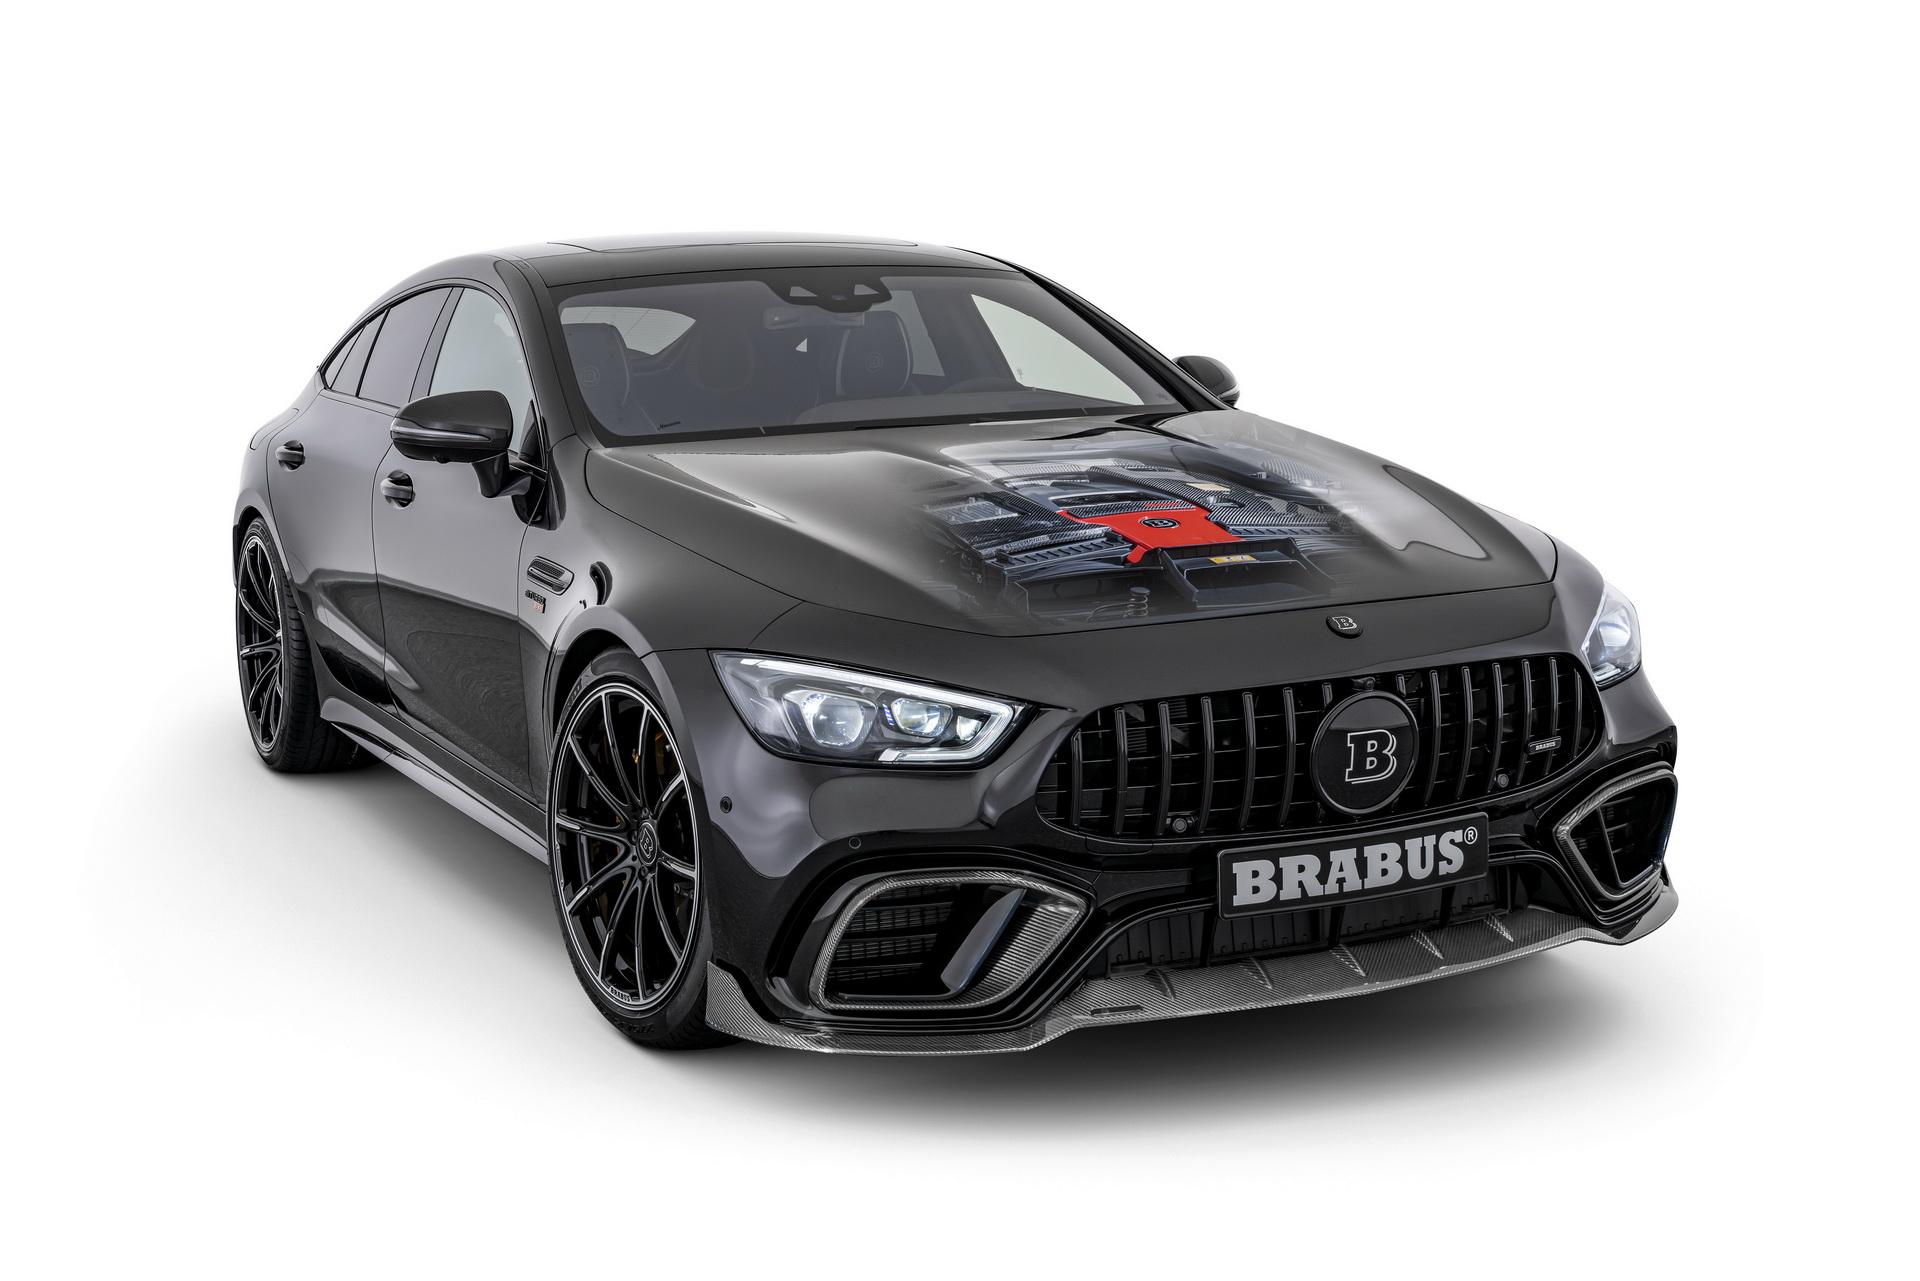 Brabus GT - Autogarage Hutapa